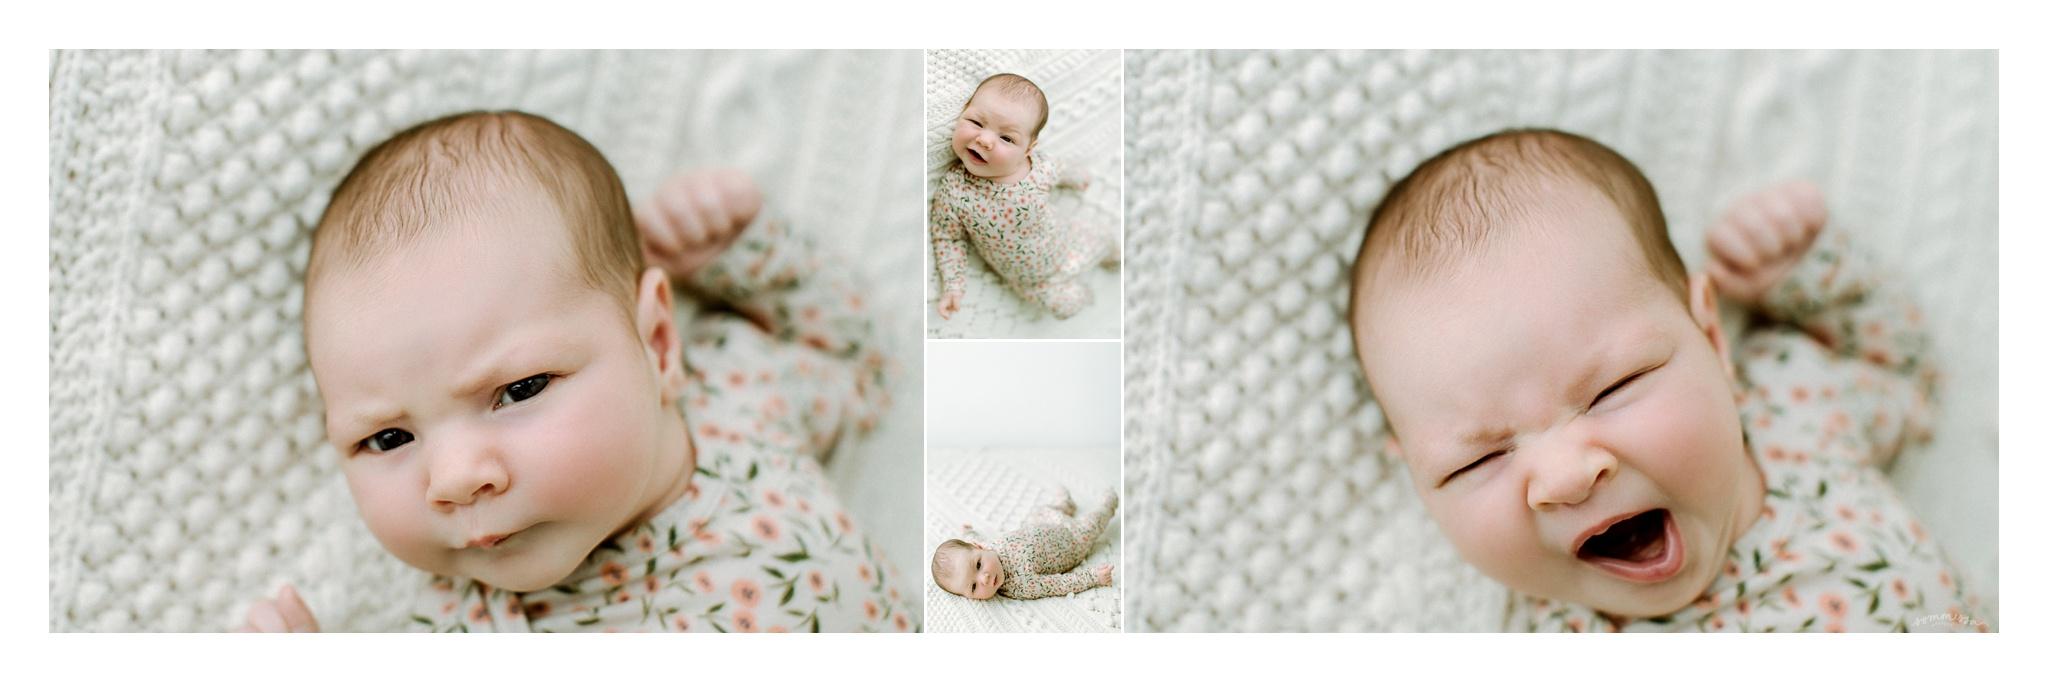 Newborn Photography in Portland, Oregon_2976.jpg